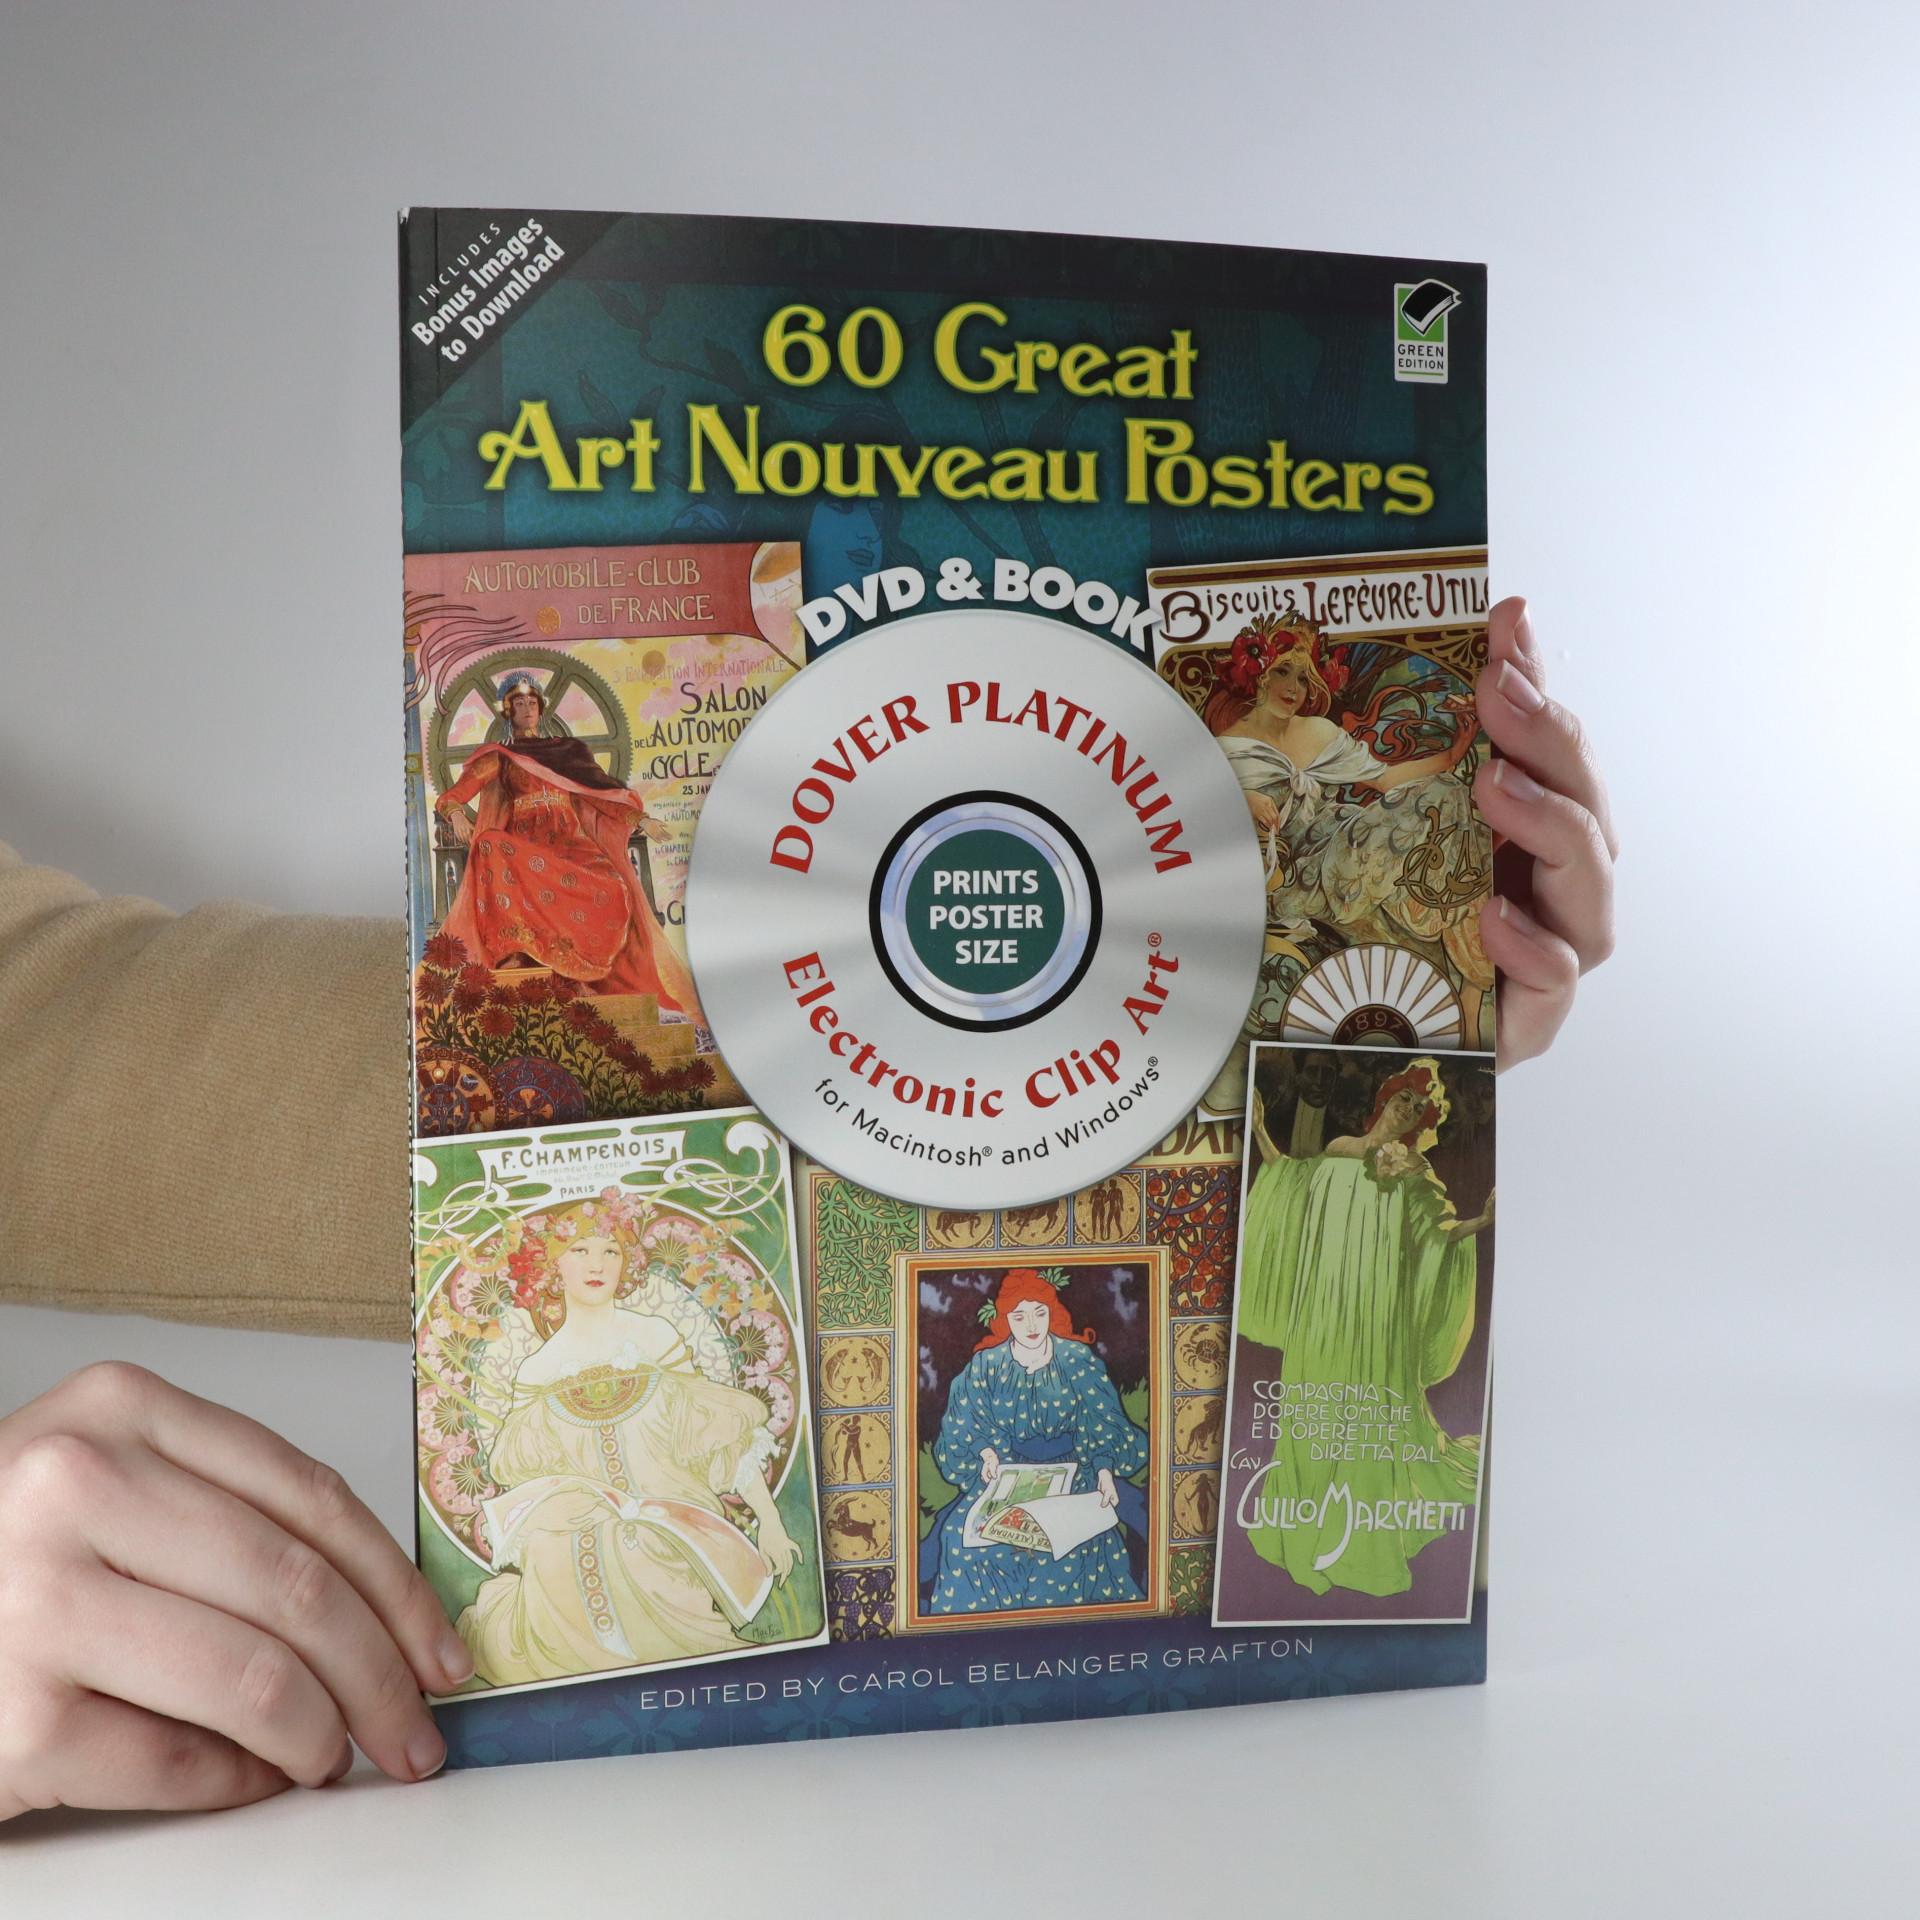 antikvární kniha 60 Great Art Nouveau Posters, neuveden